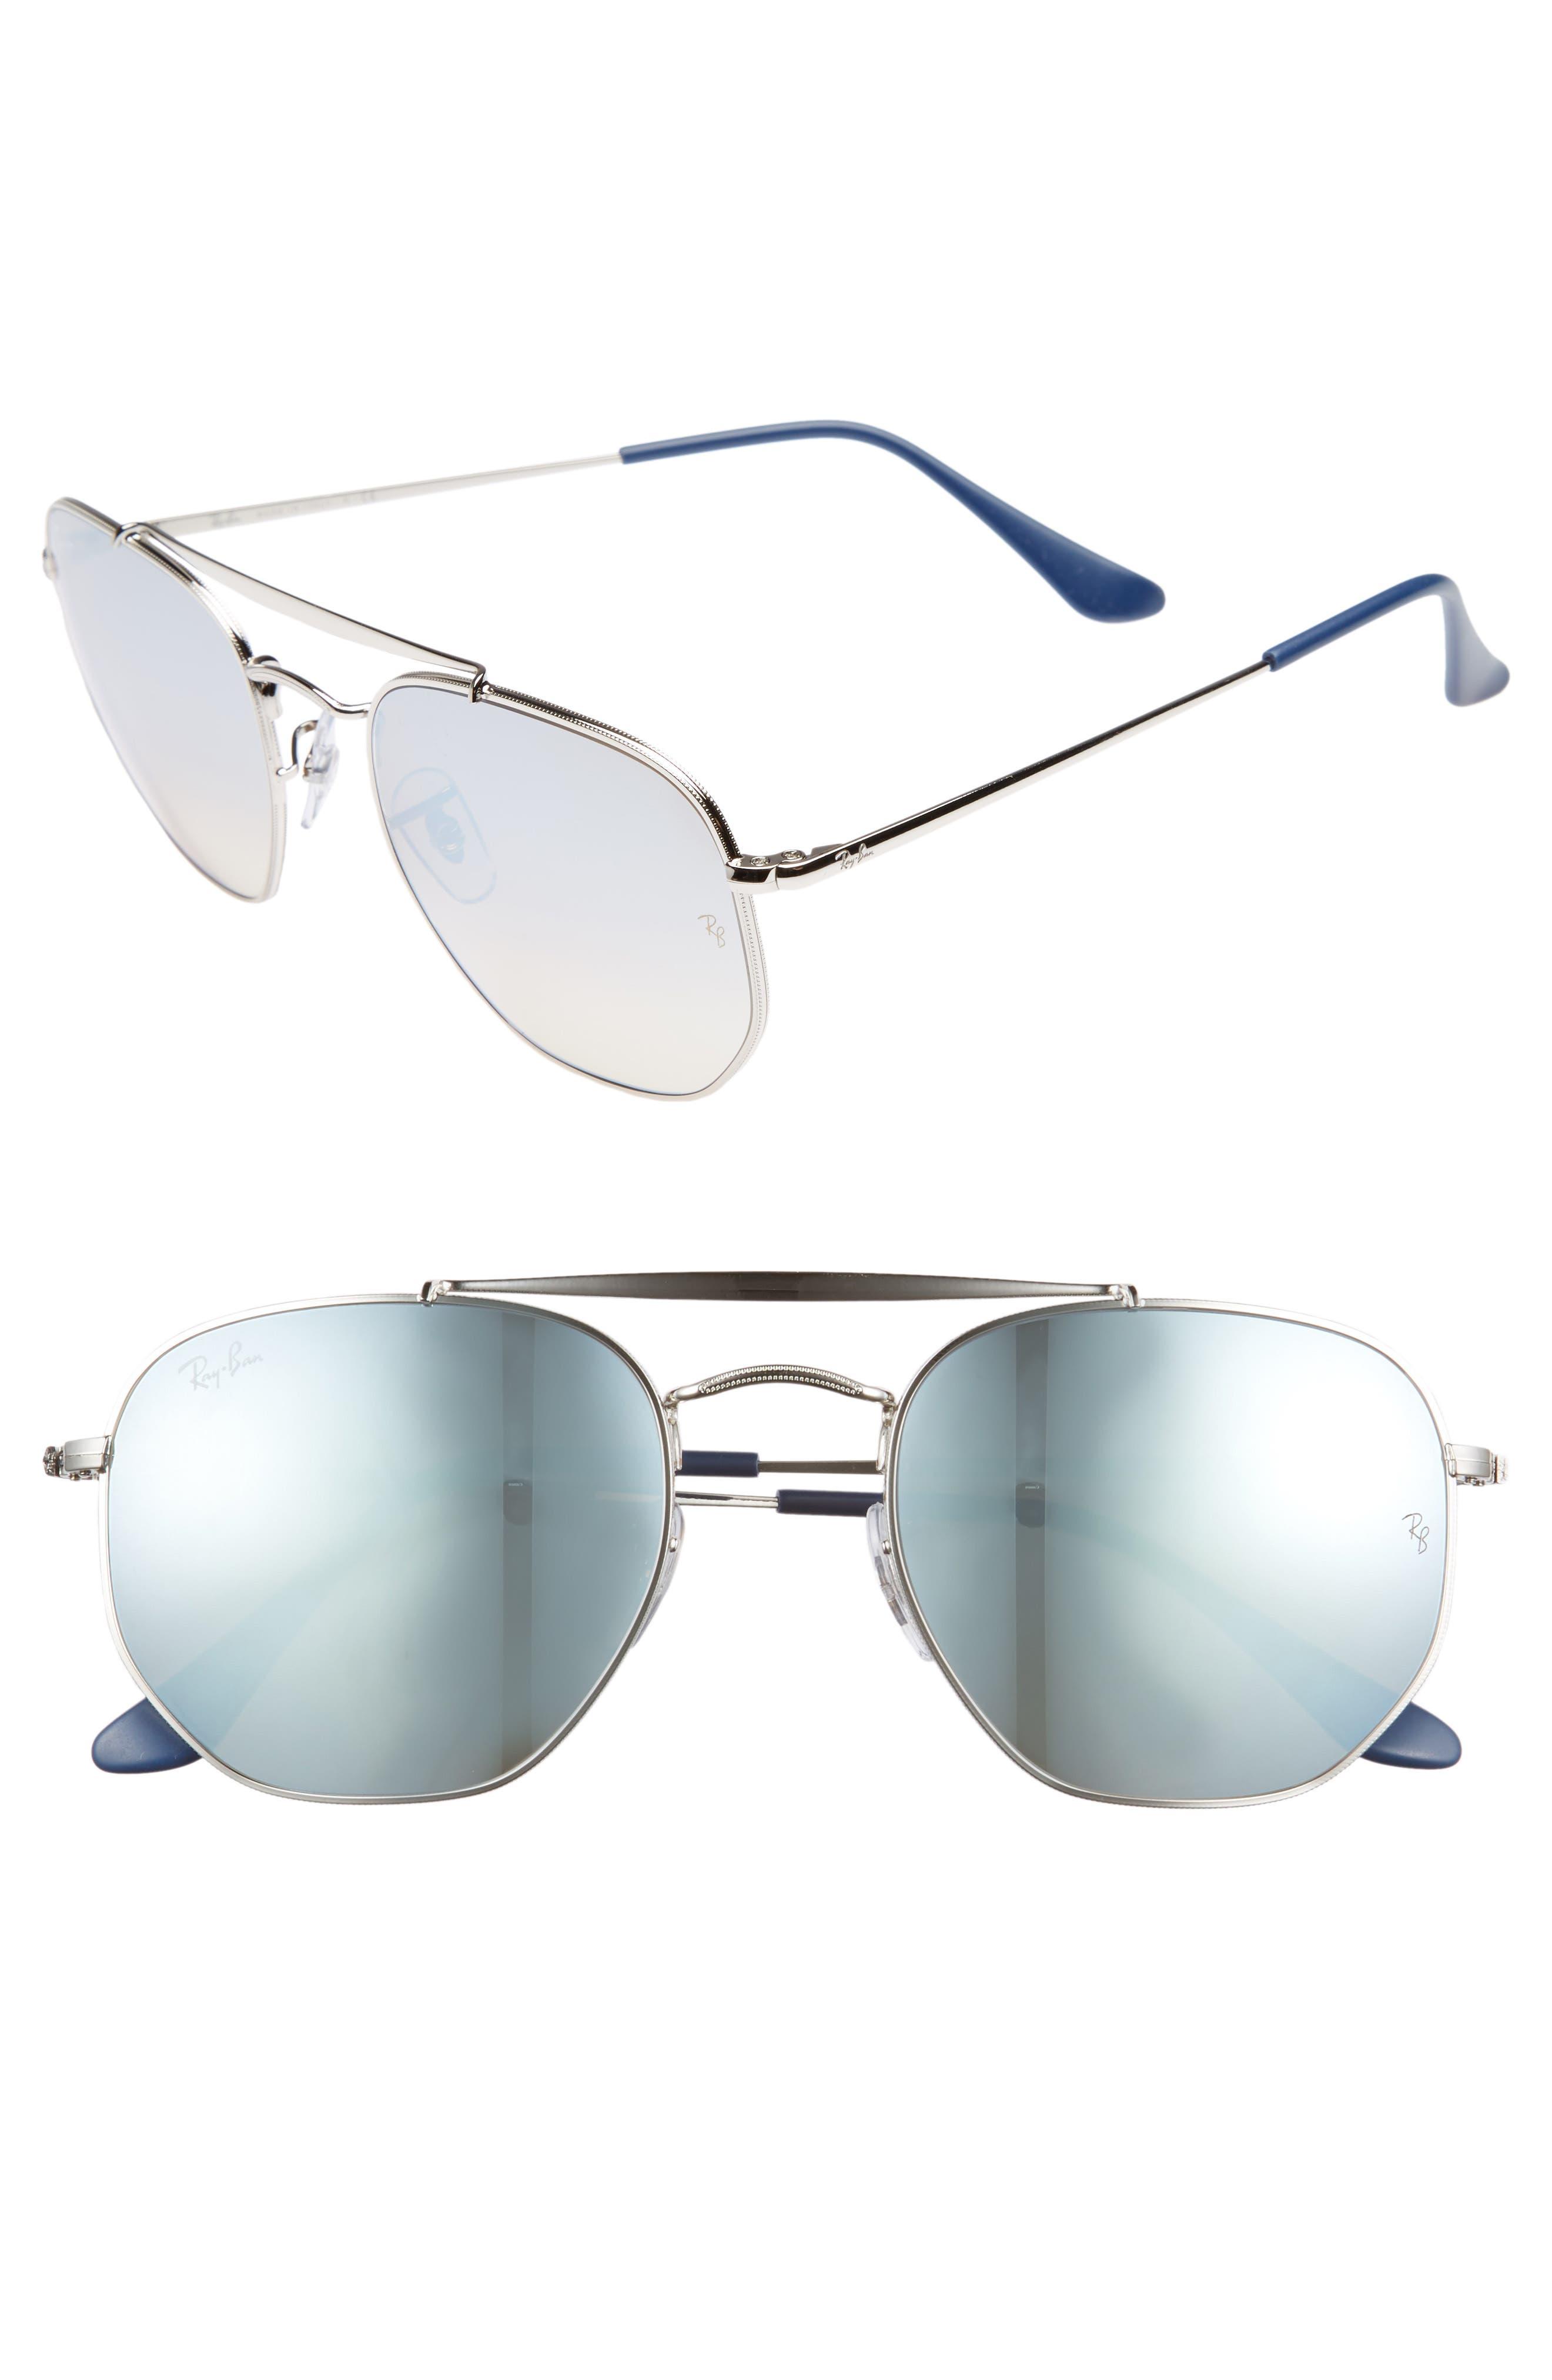 Marshal 54mm Aviator Sunglasses,                             Main thumbnail 1, color,                             040